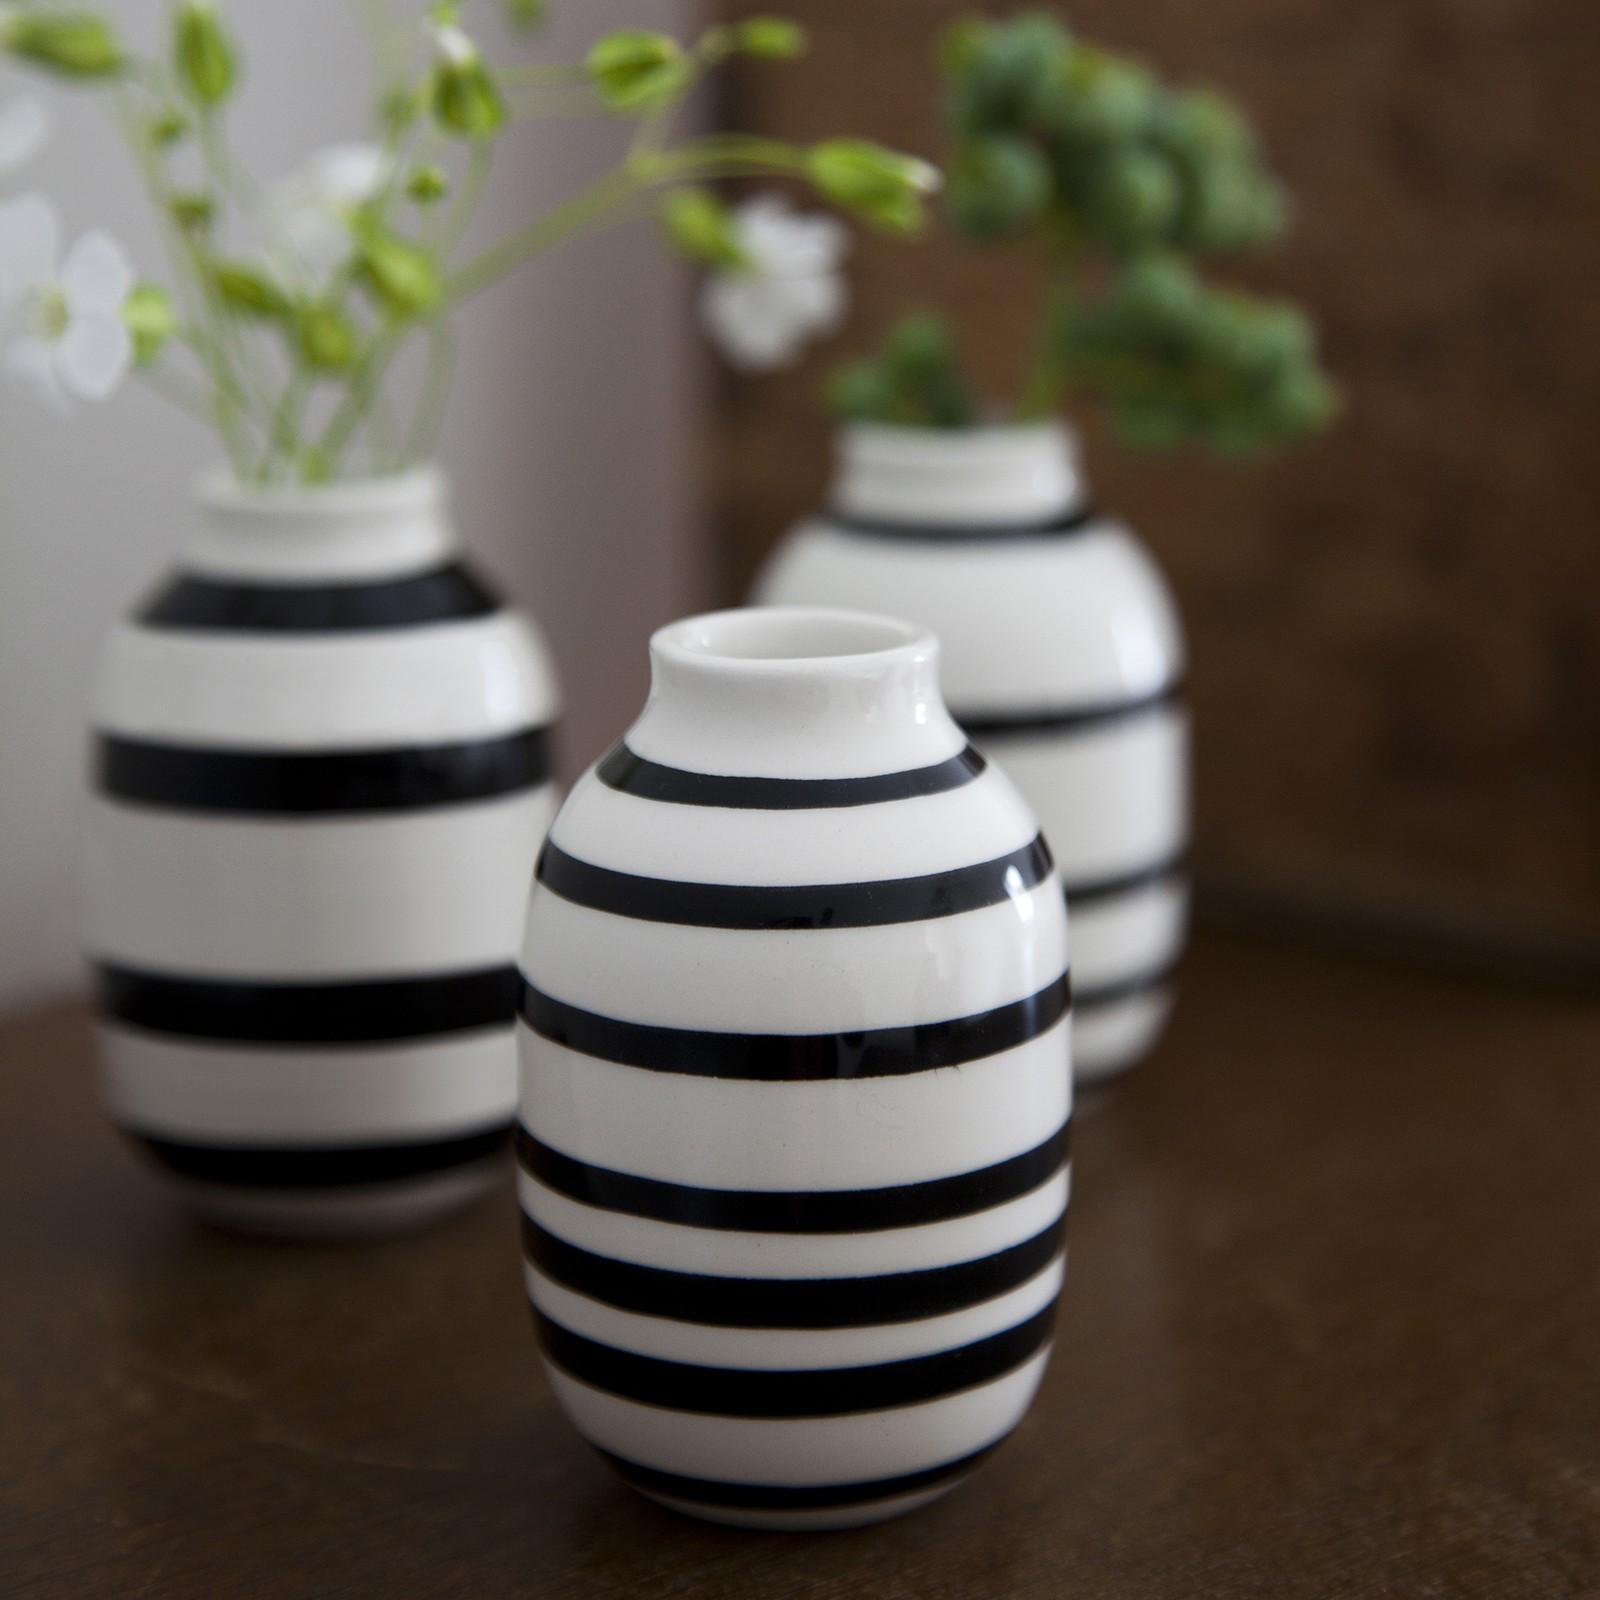 omaggio-vase-sort-miniature-2_1